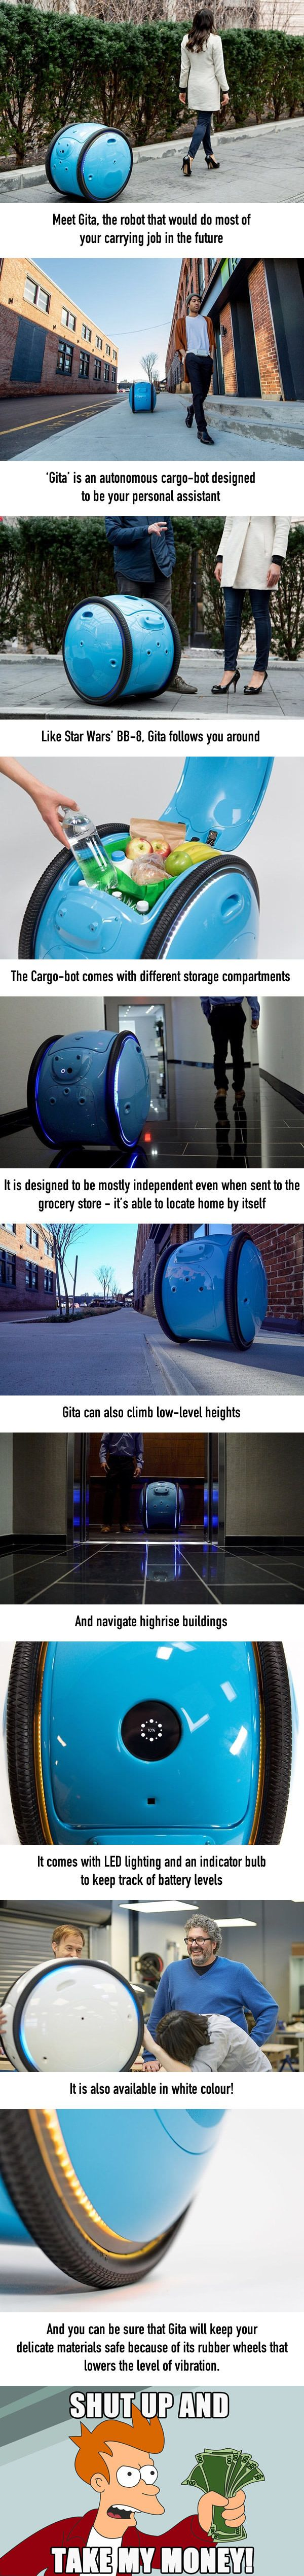 Gita Is an Autonomous Cargo Robot That Will Follow You Around - 9GAG